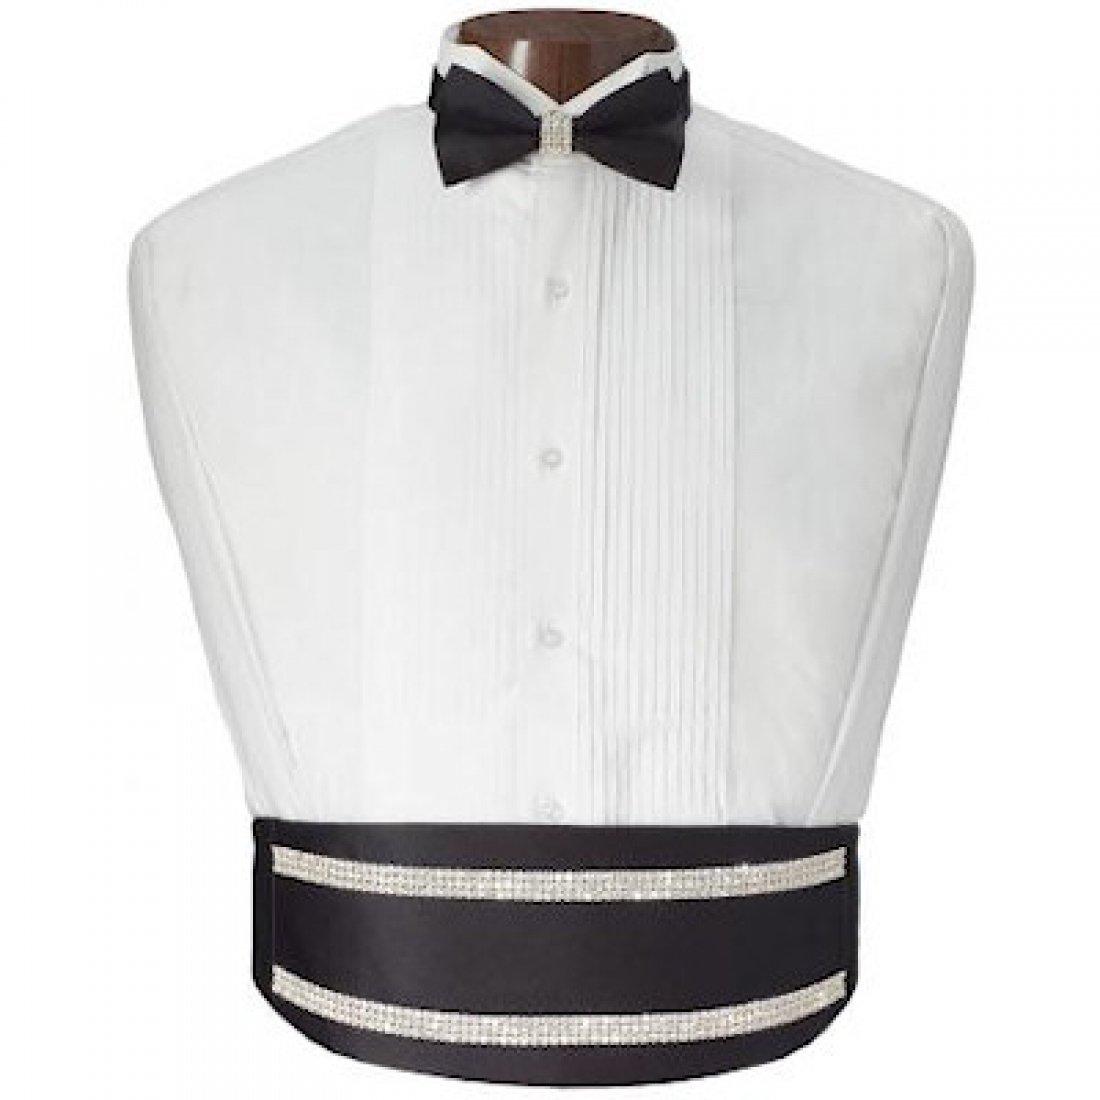 CDM product Rhinestone Shimmer Tuxedo Cummerbund and Bow Tie big image